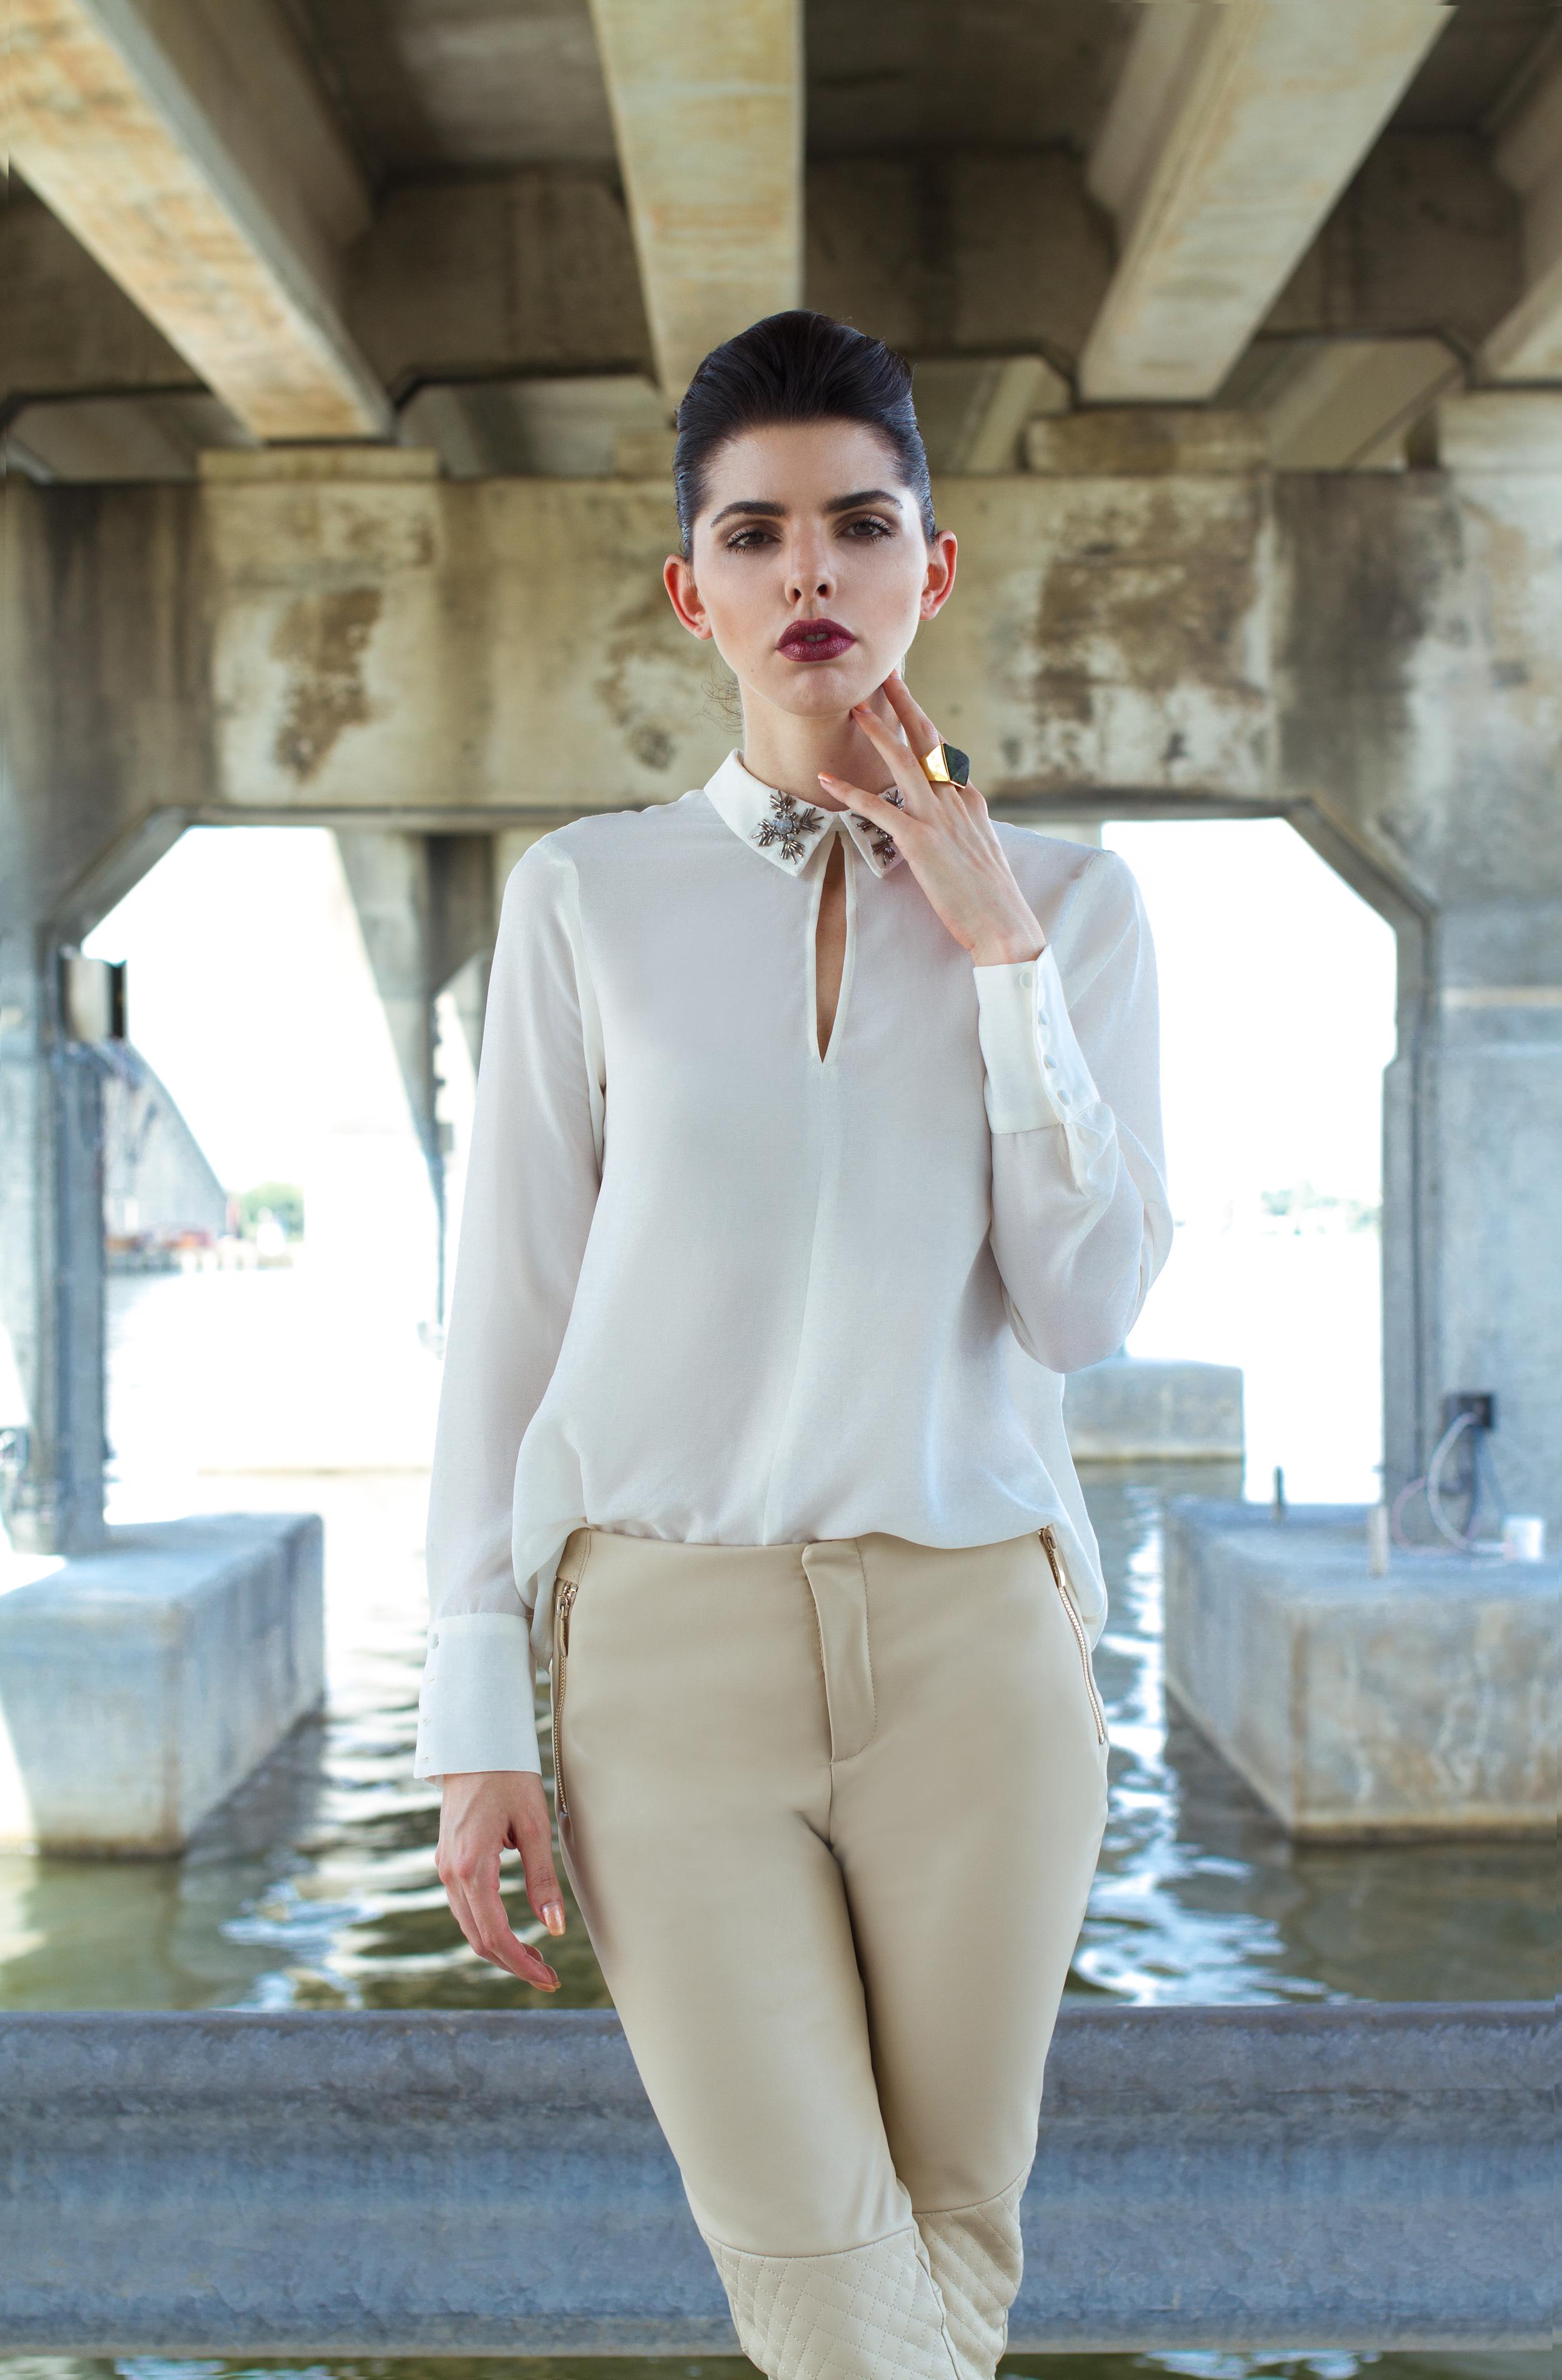 fashioneditorial_AlexisP_vaniaelise-0309.jpg